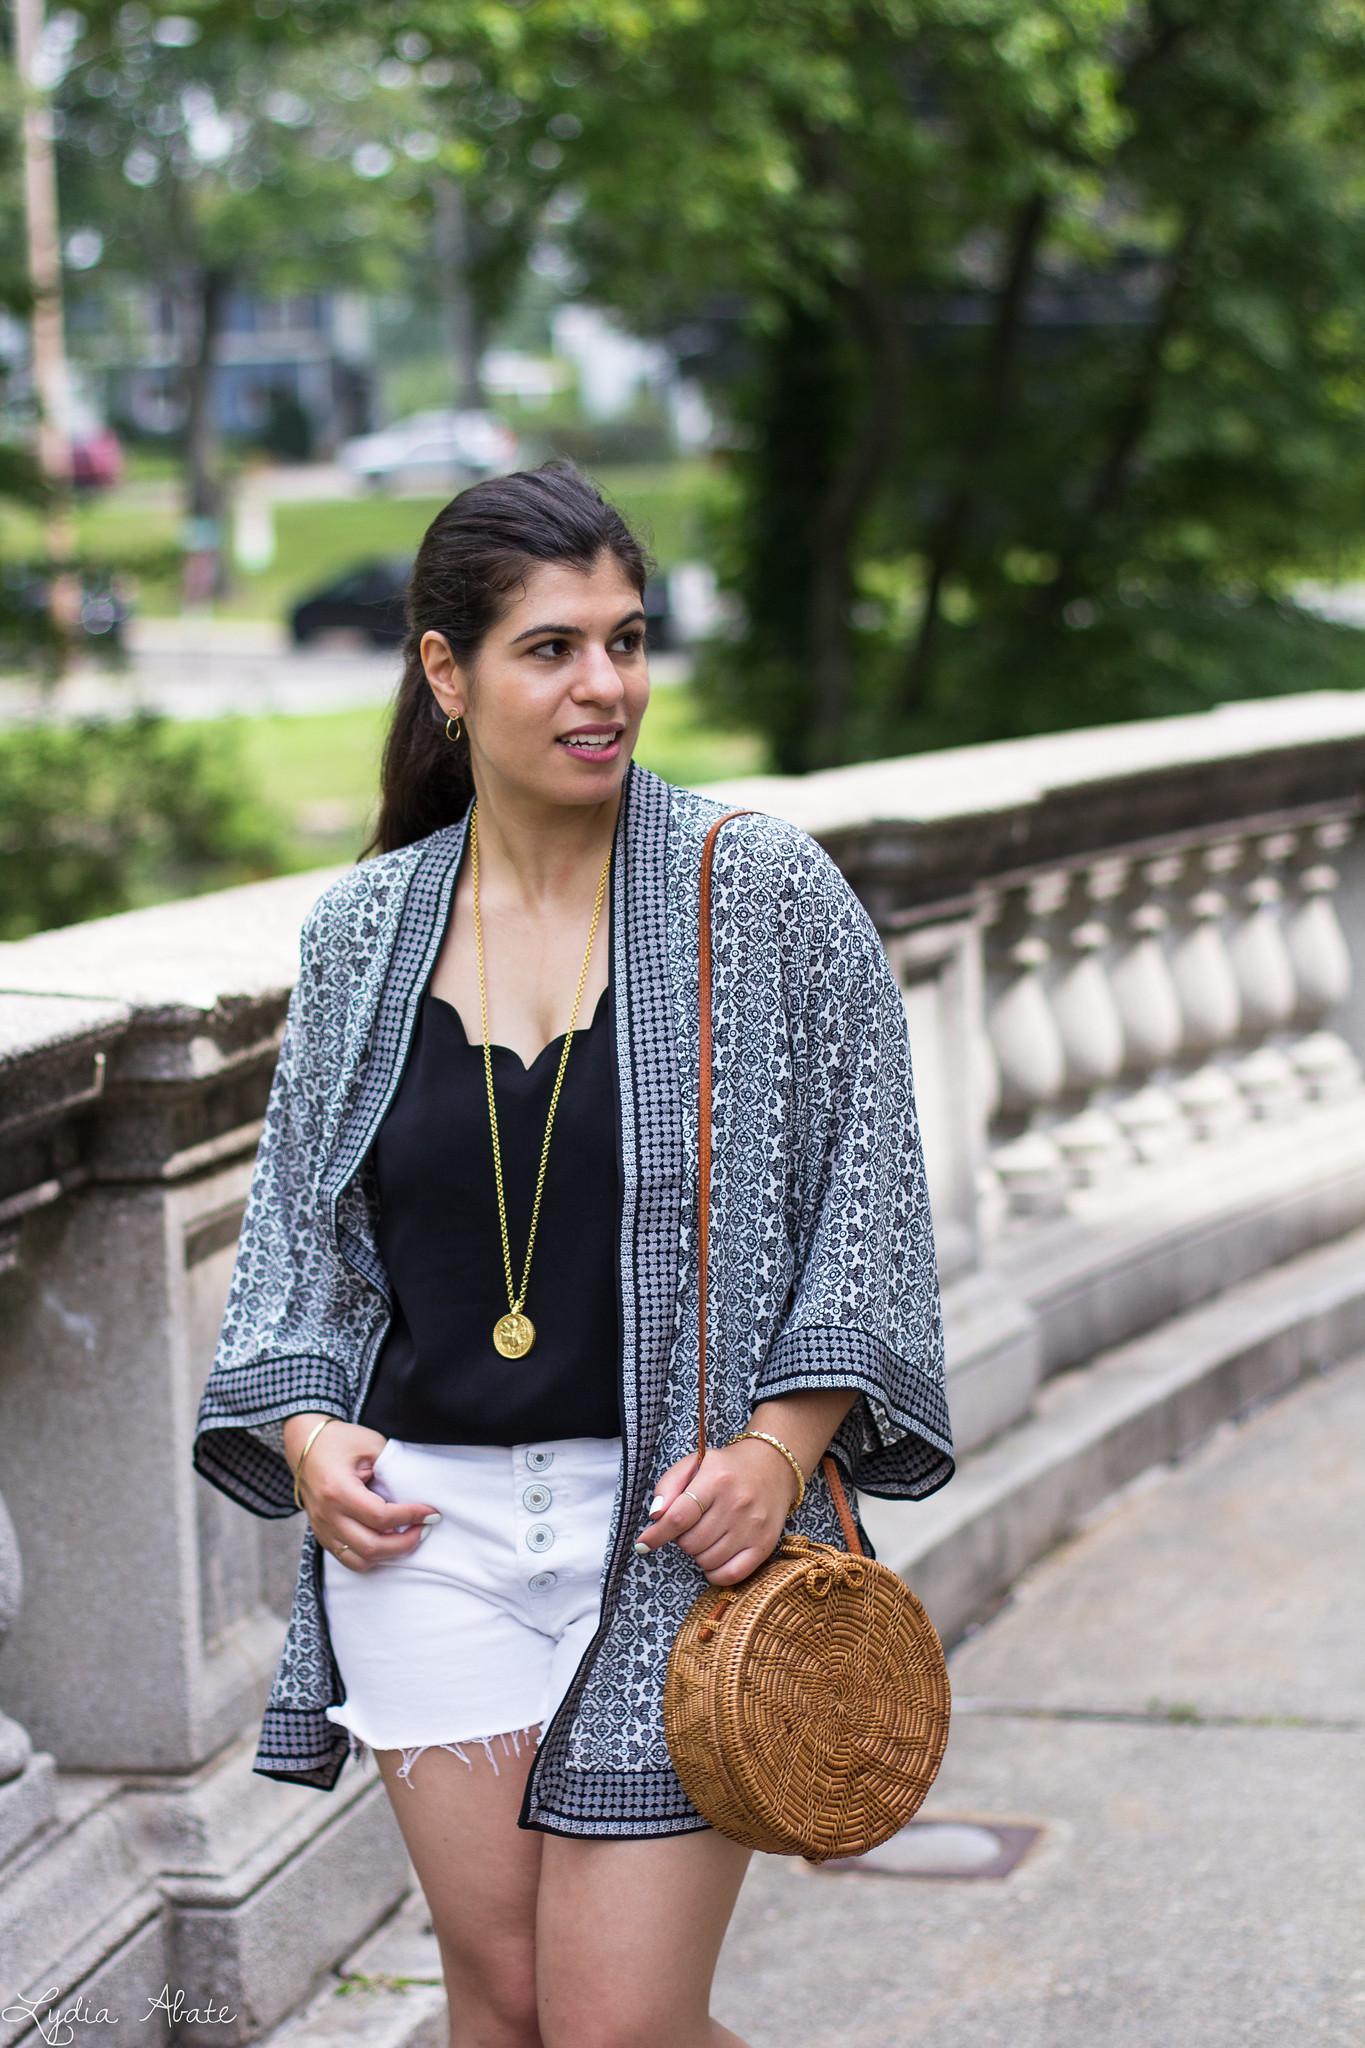 Black and White Kimono, Denim Cut-off Shorts, Round Straw Bag-15.jpg